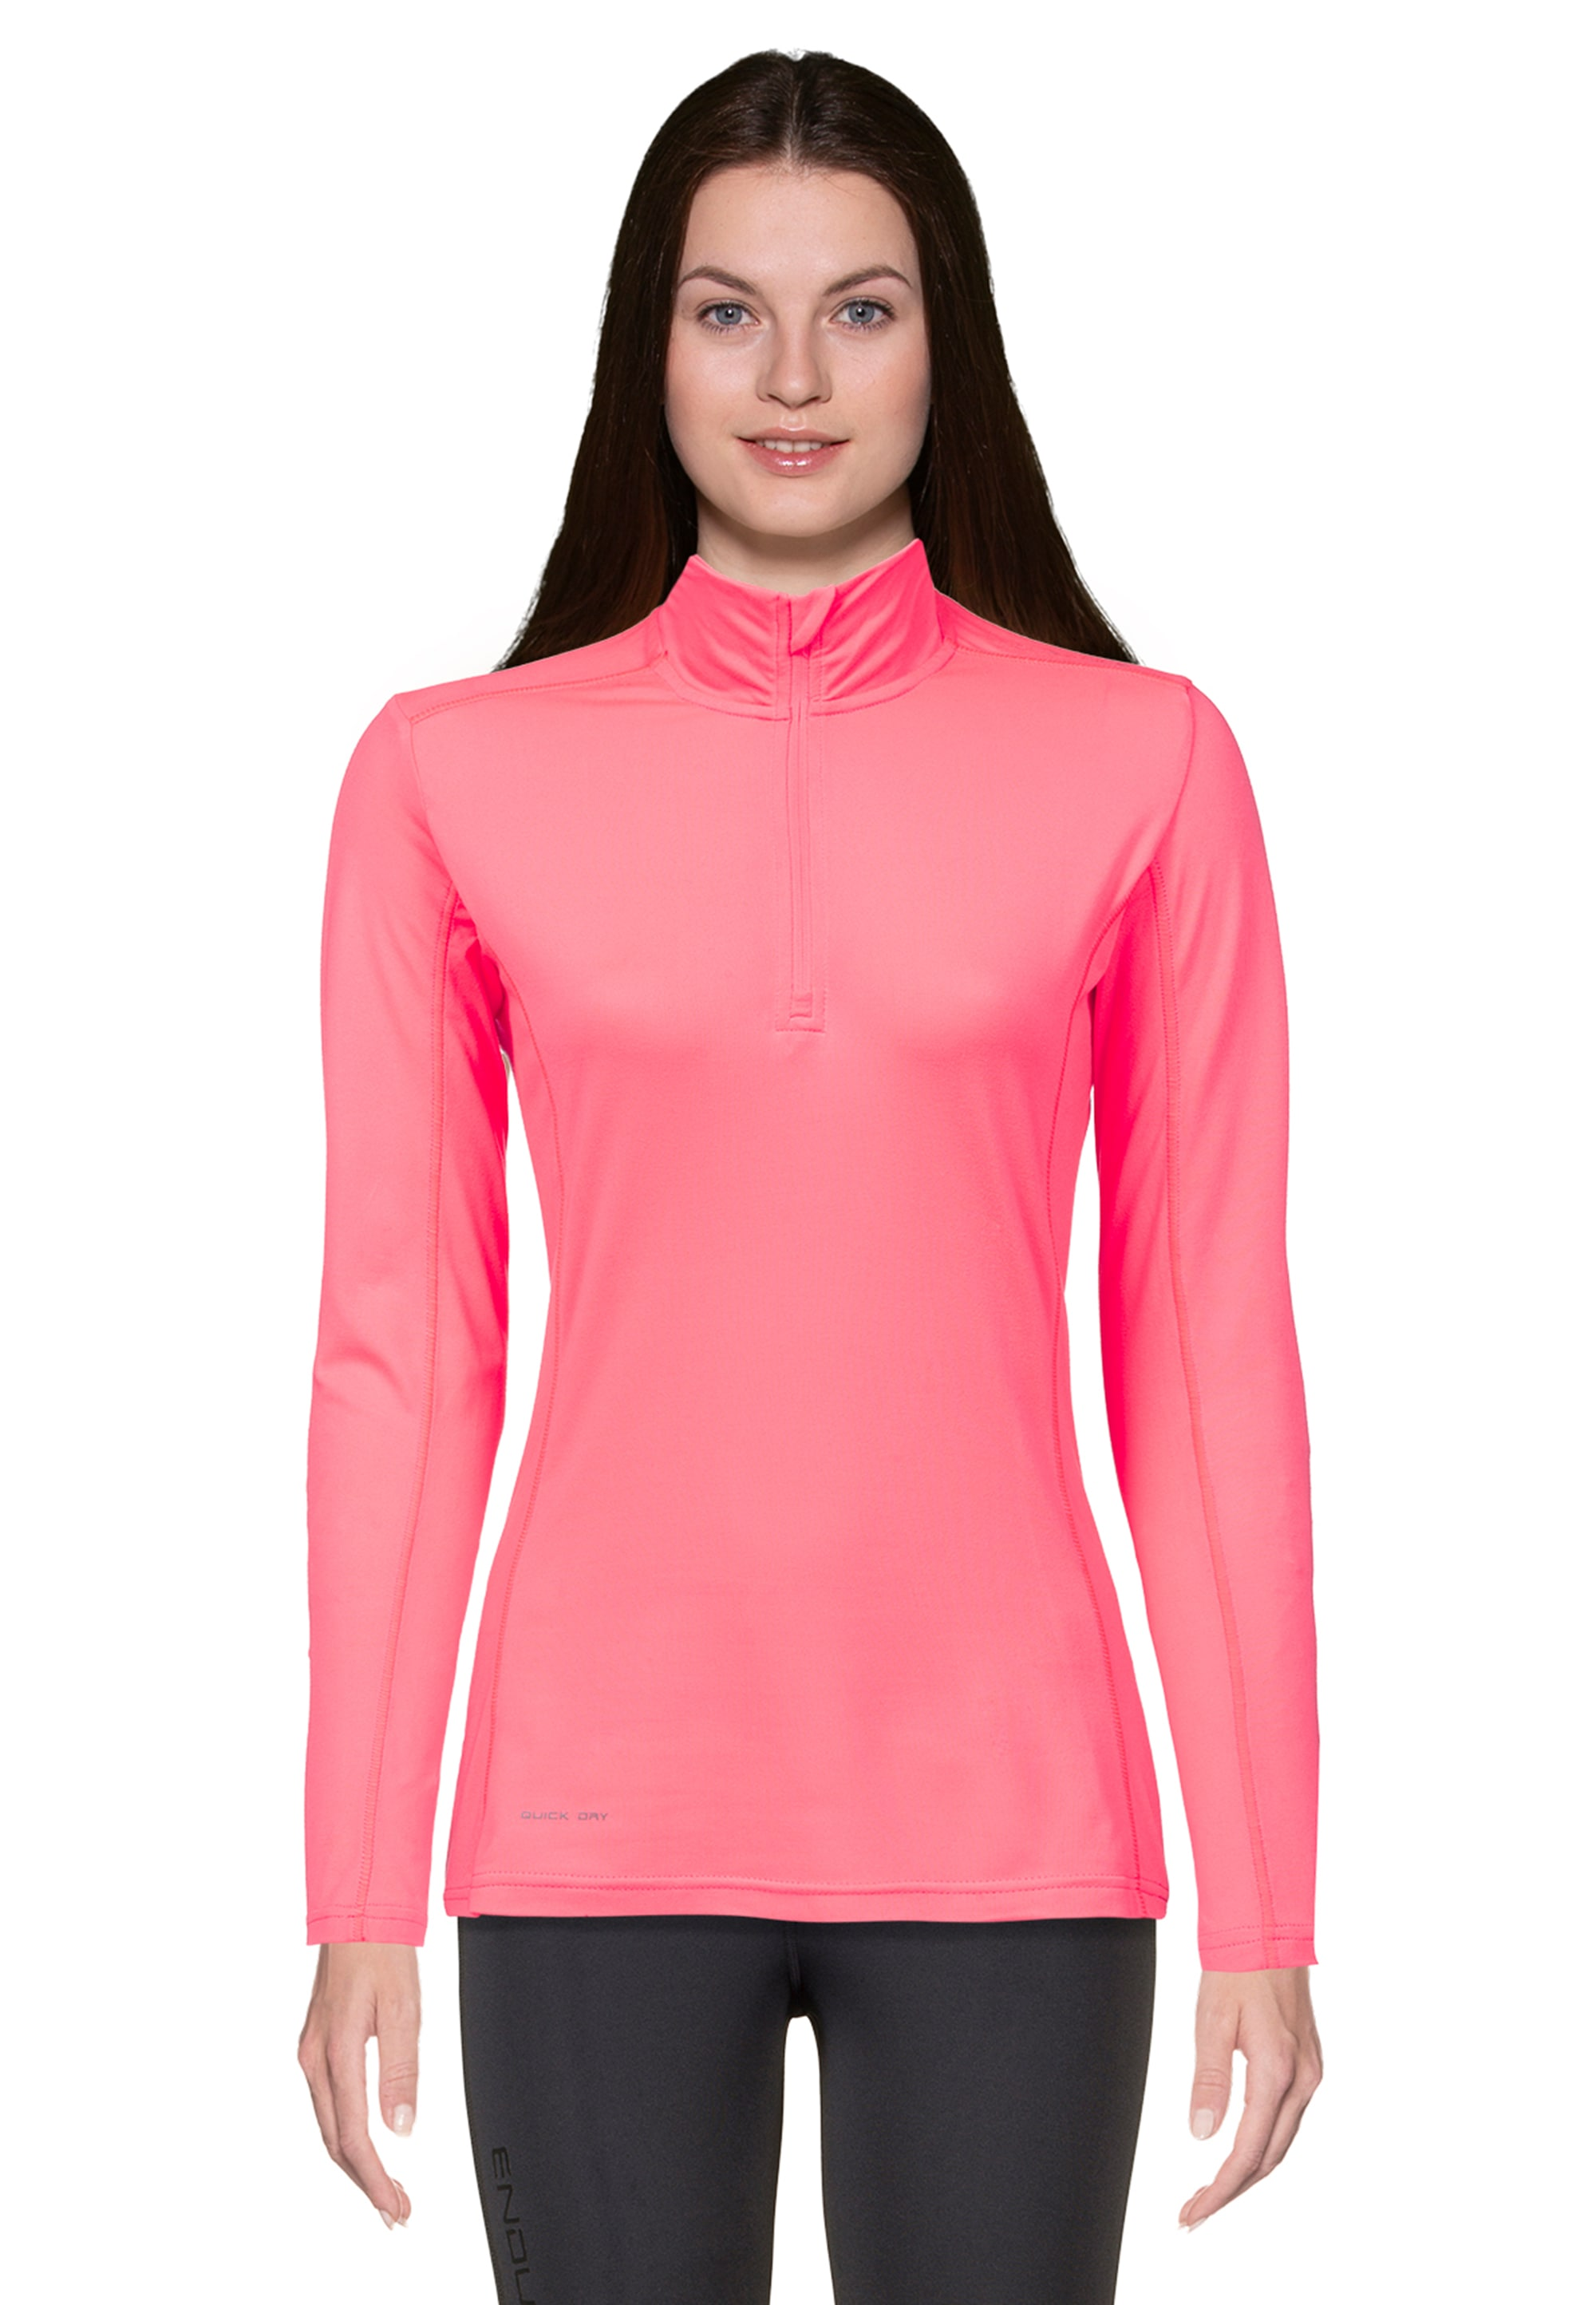 ENDURANCE Funktionsshirt mit QUICK DRY-Technologie Timika | Bekleidung > Shirts > Funktionsshirts | Endurance